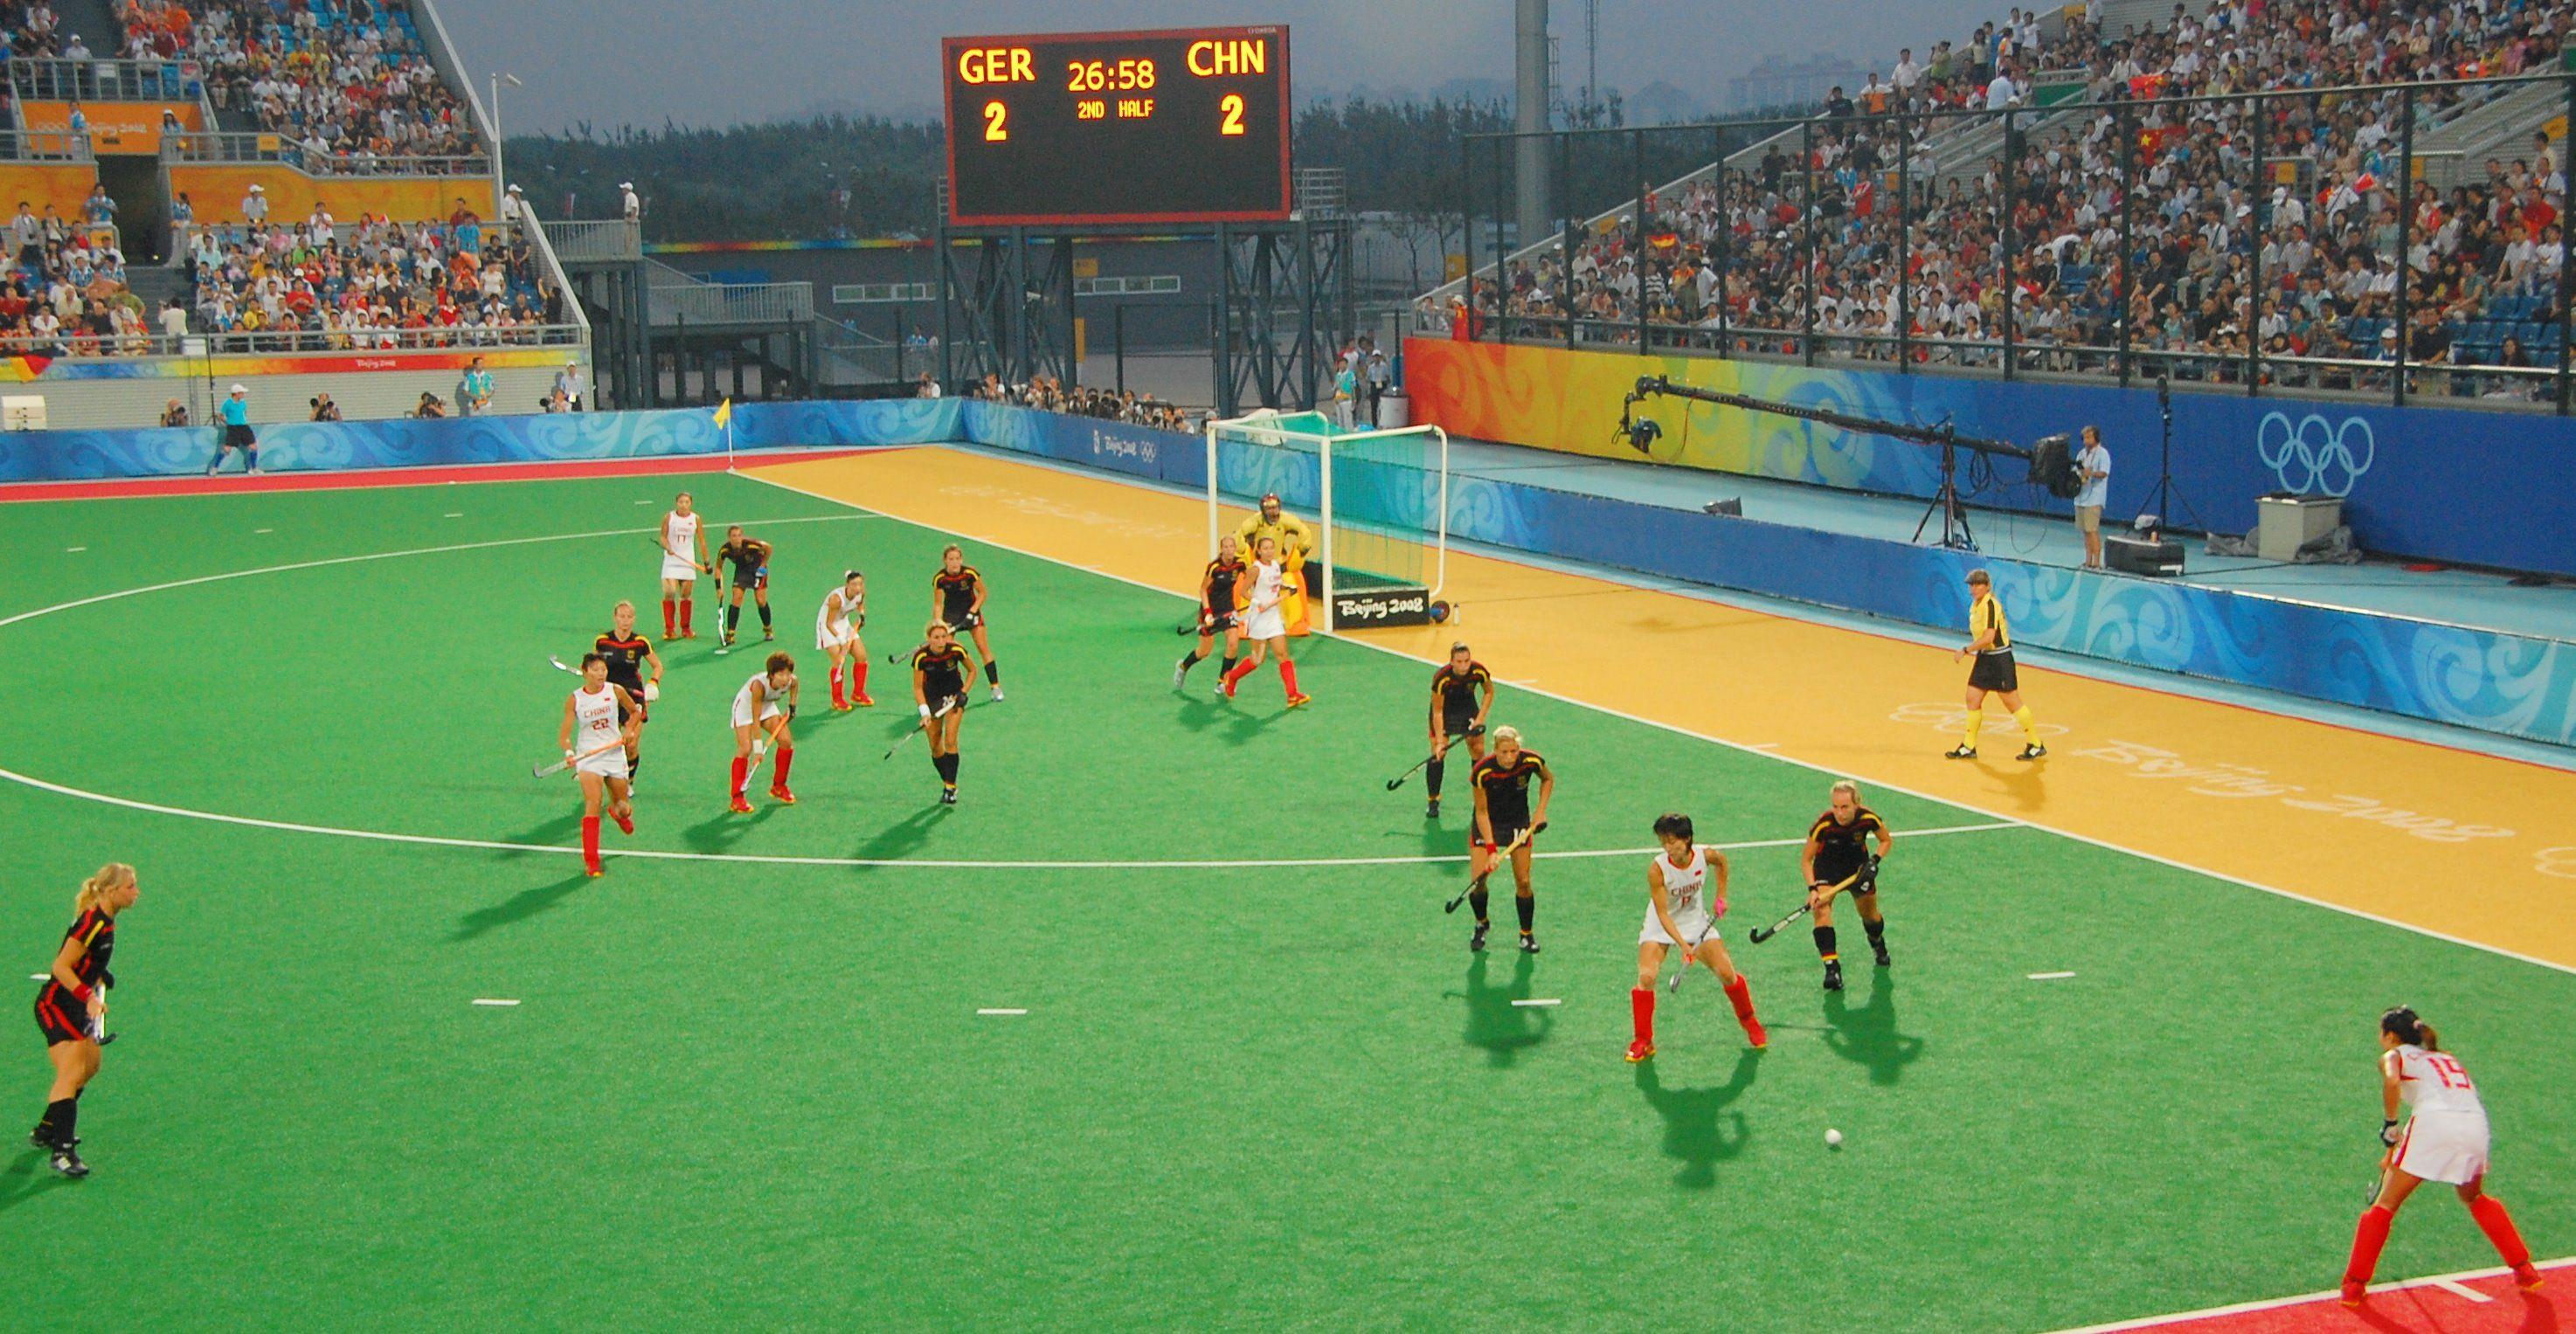 Germany Vs China In Women S Field Hockey At The Beijing Olympics Www Findaballer Com Field Hockey Beijing Olympics Womens Field Hockey